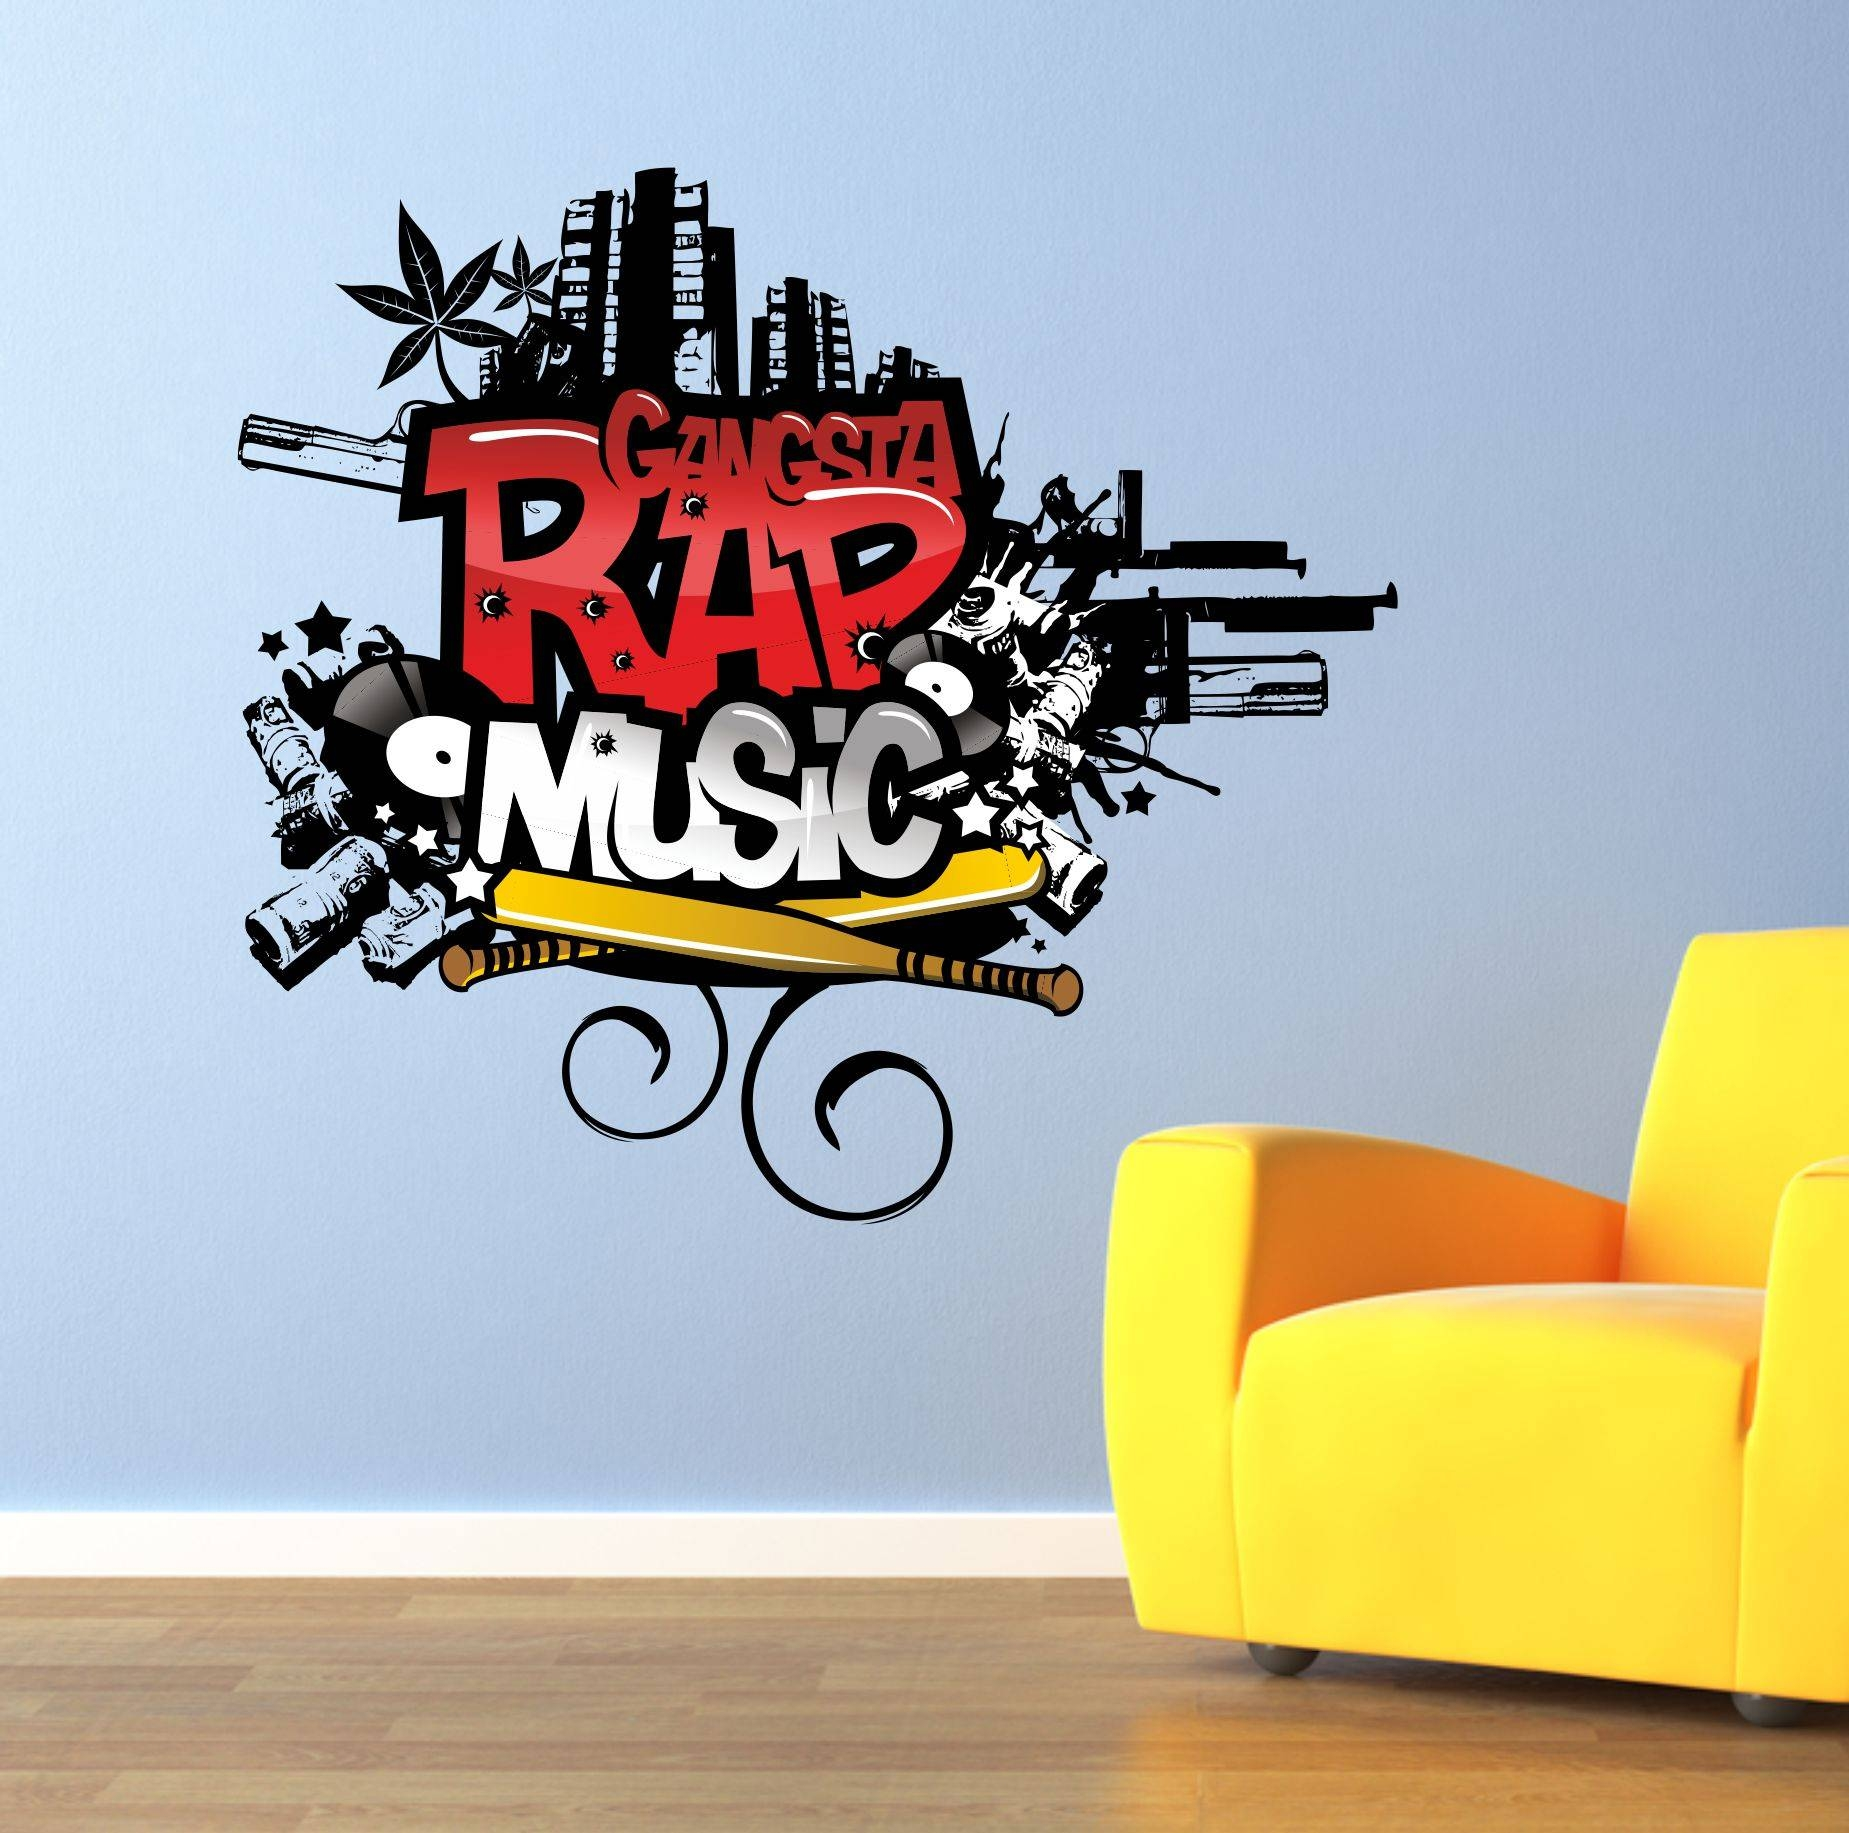 The Grafix Studio | Gangsta Rap Music Graffiti Wall Art Sticker Pertaining To 2018 Graffiti Wall Art Stickers (View 3 of 30)